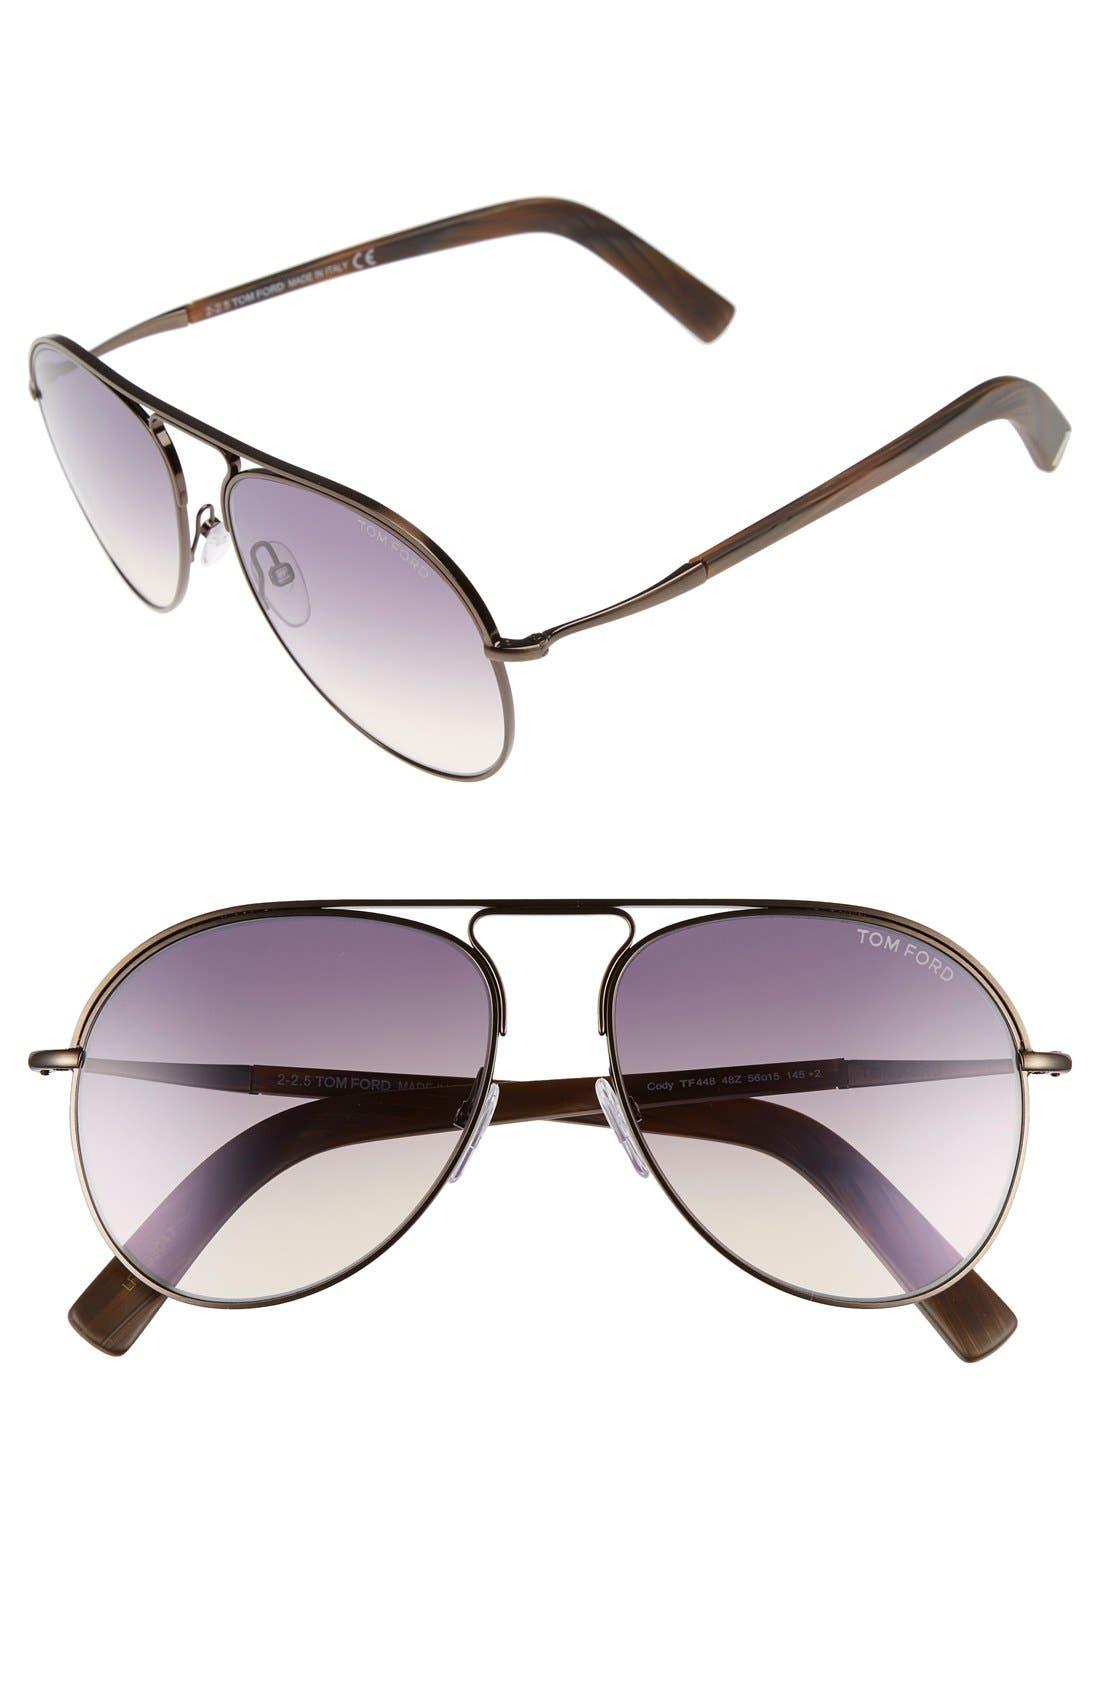 Alternate Image 1 Selected - Tom Ford 'Cody' 56mm Aviator Sunglasses